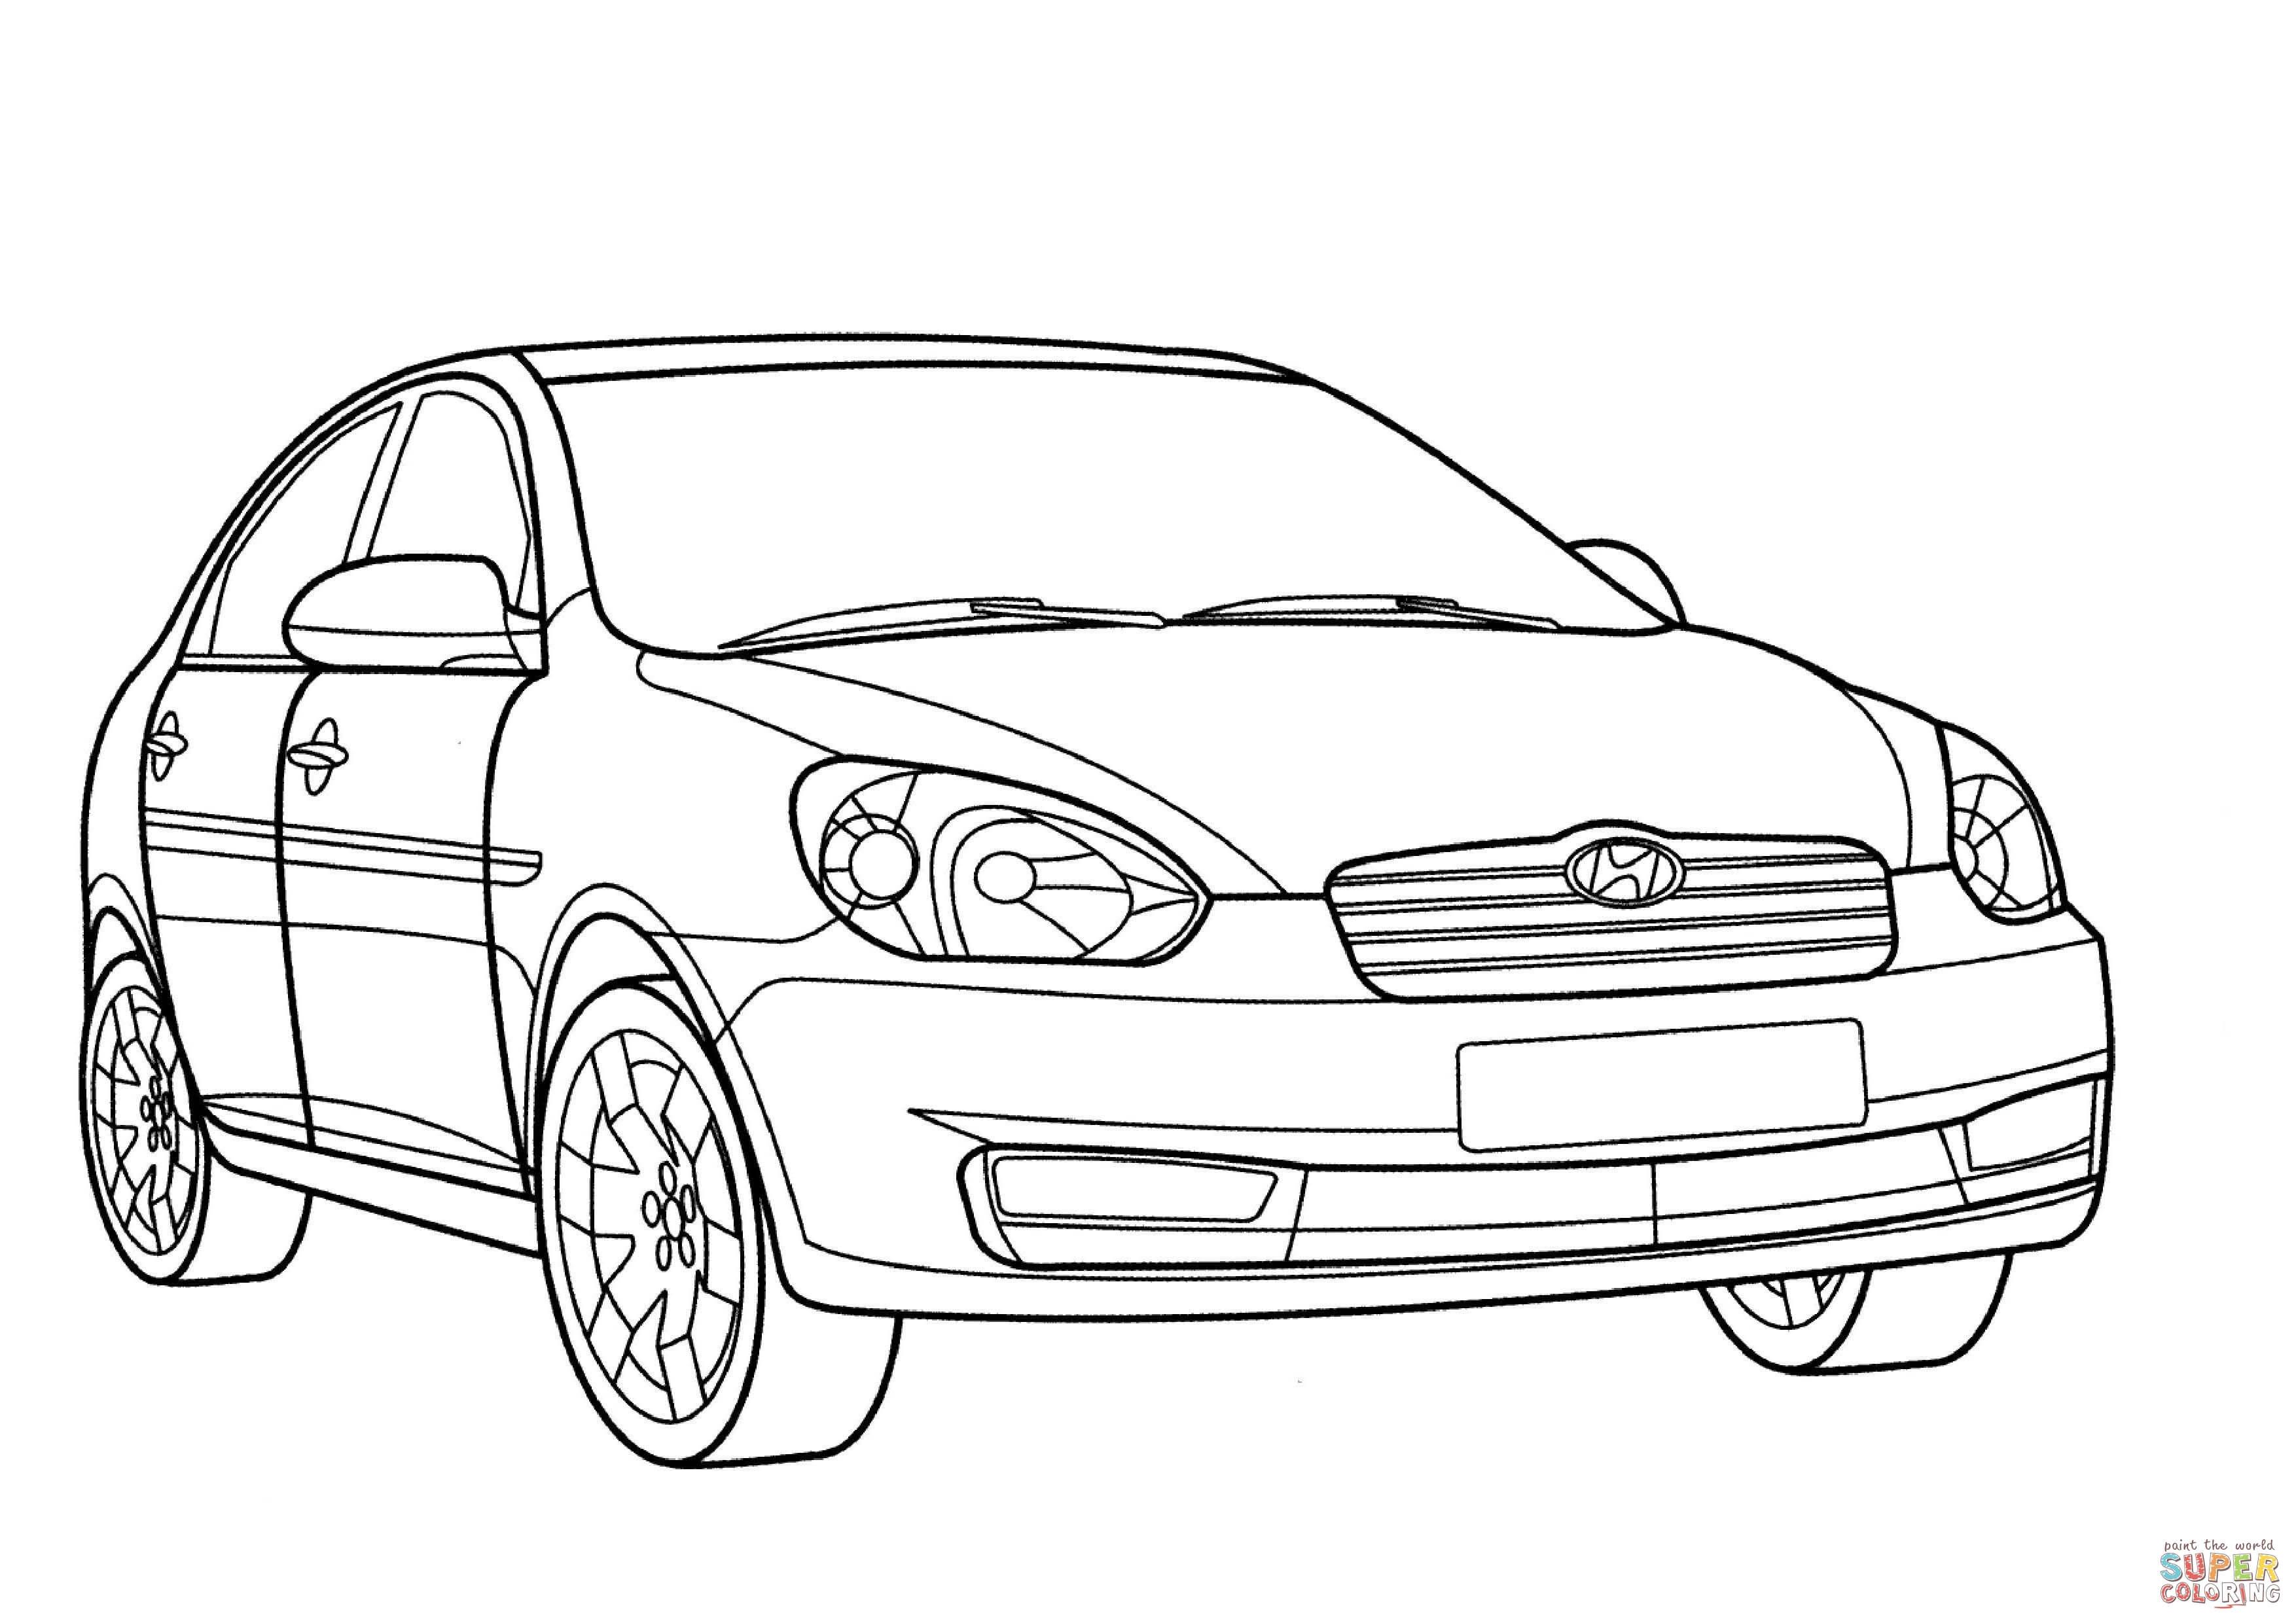 Dibujo De Hyundai Verna Para Colorear